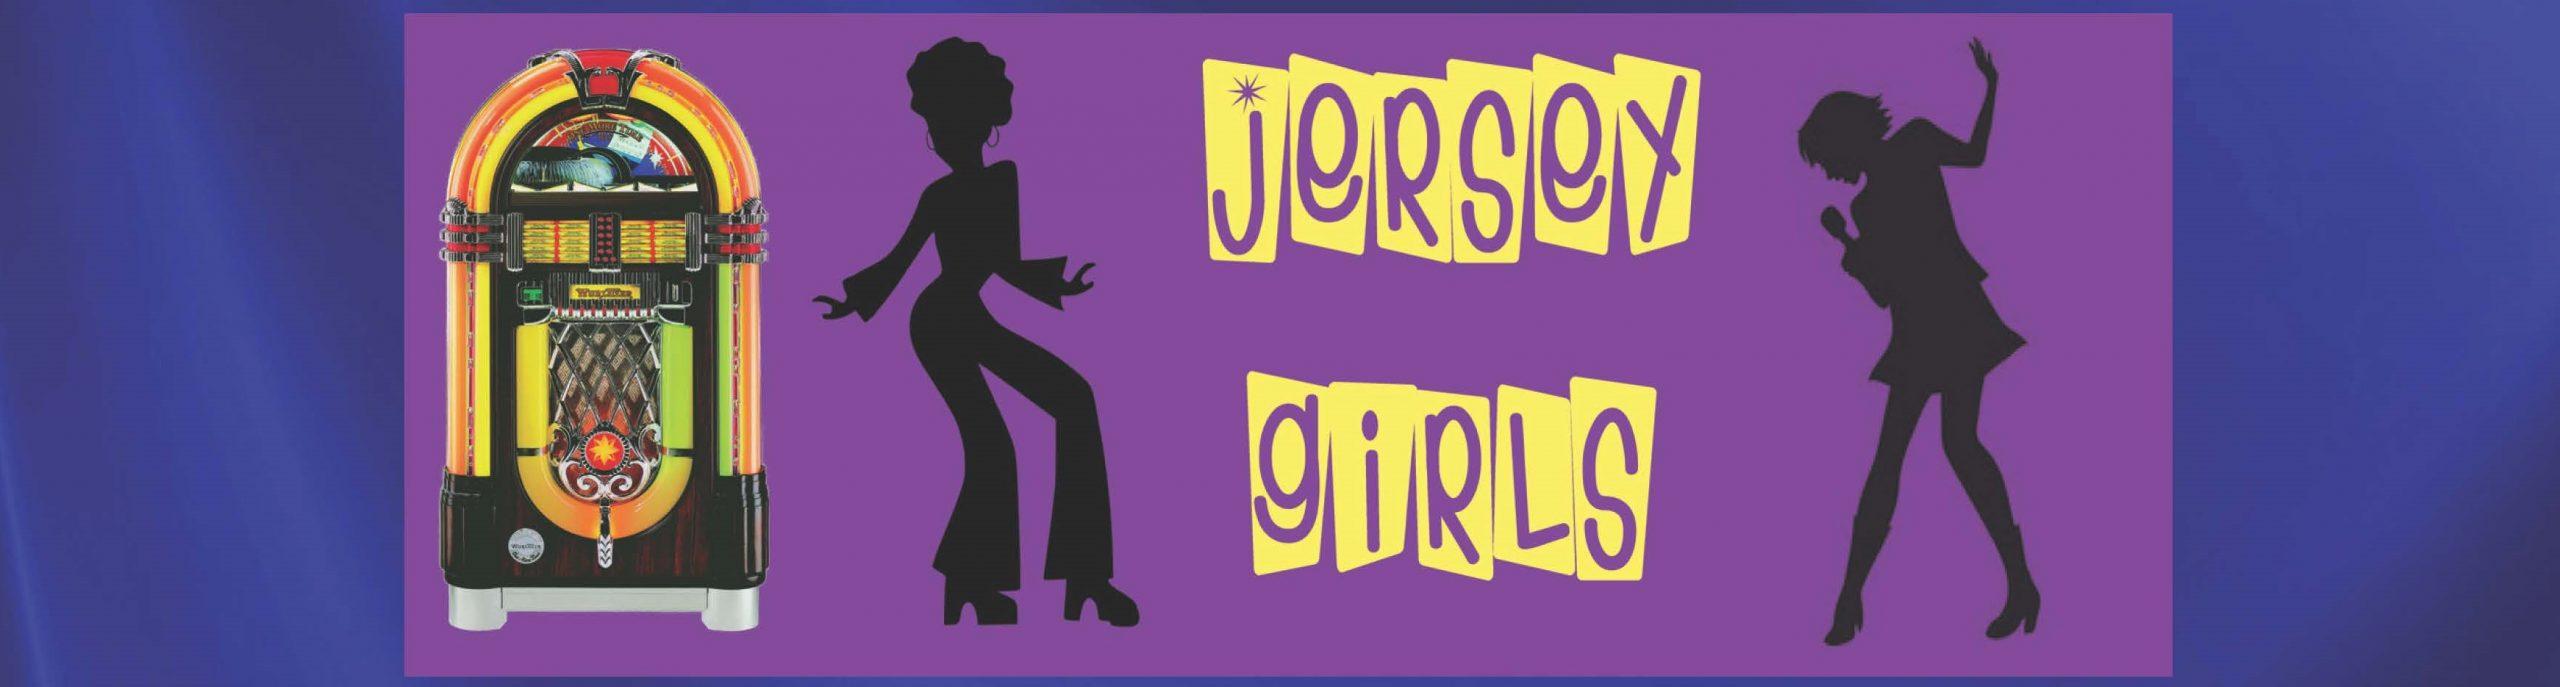 Friday Night Liveish Jersey Girls